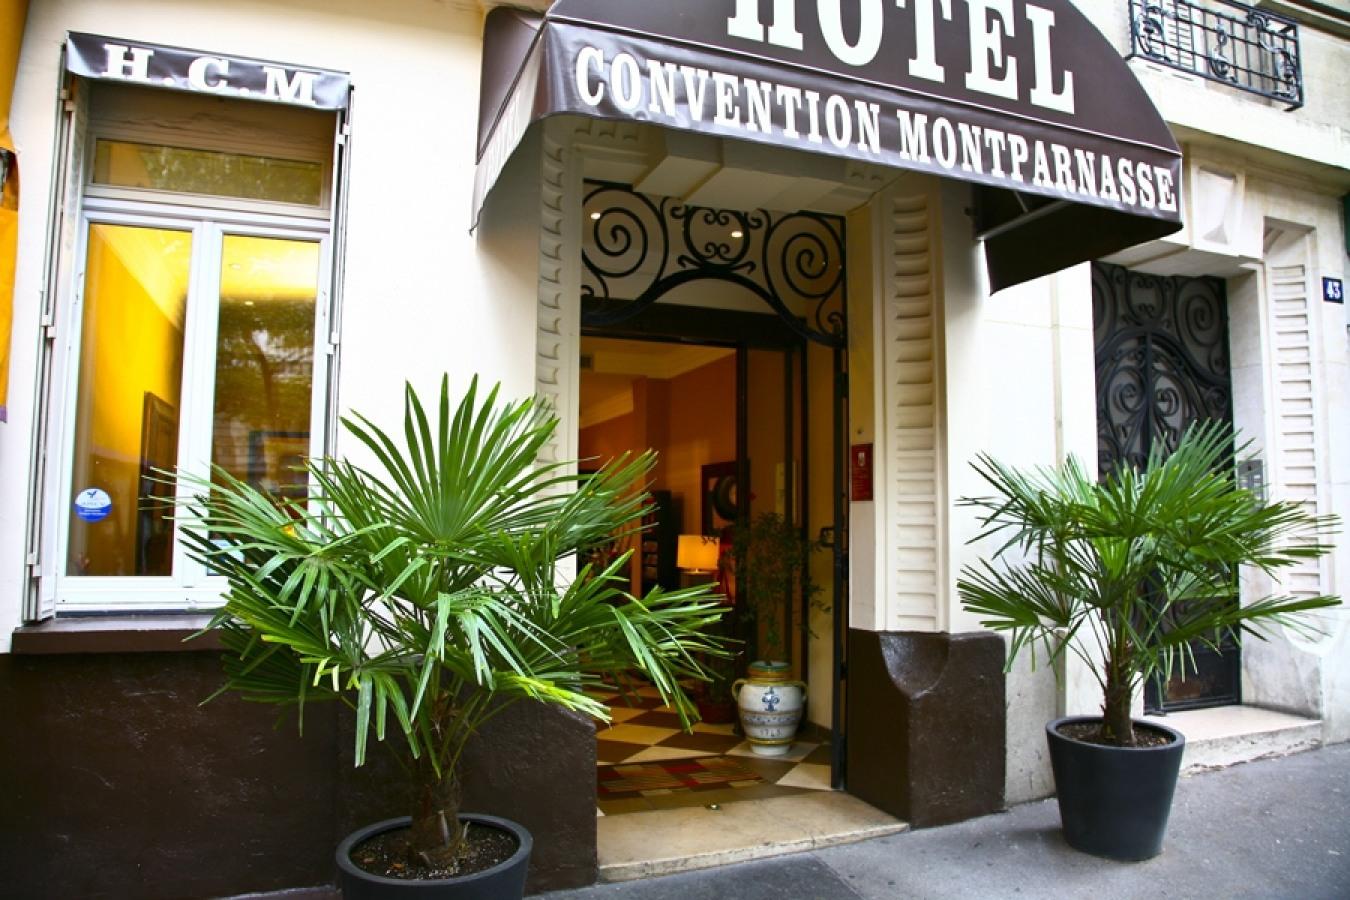 Hotel Convention Montparnasse - Hotel